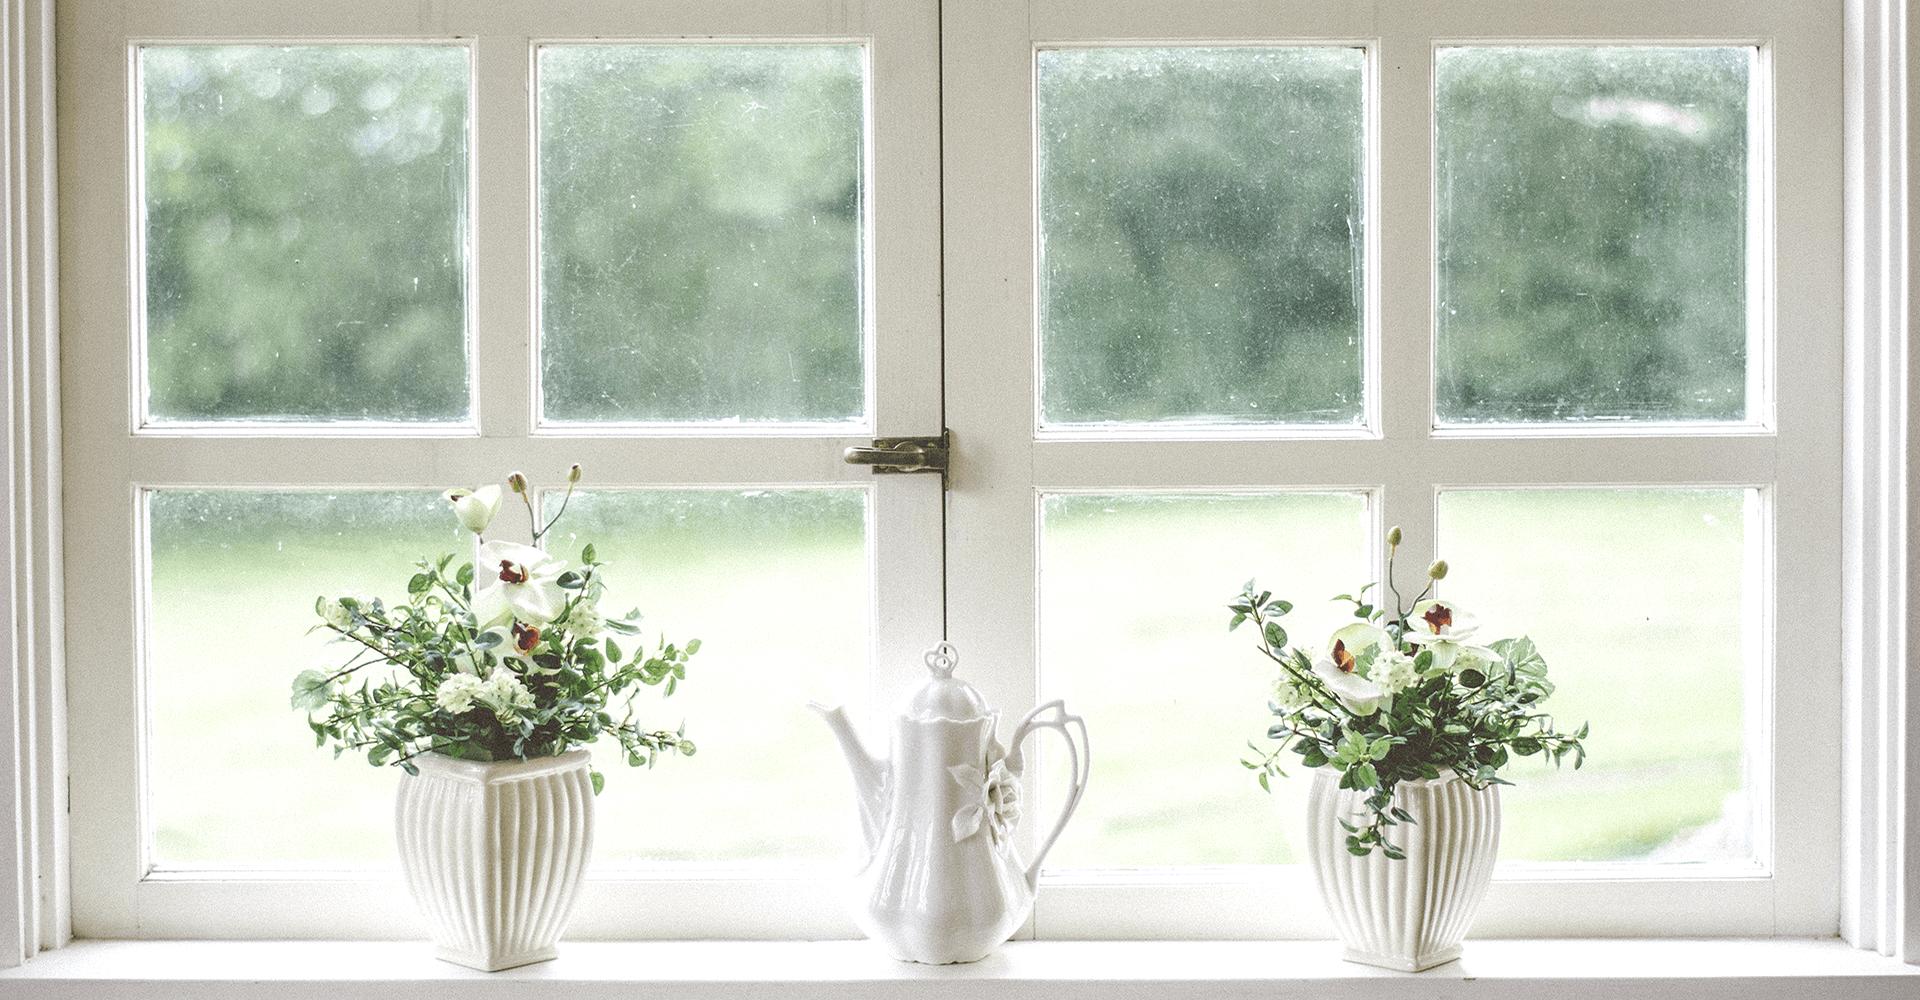 natural lighting - clean windows